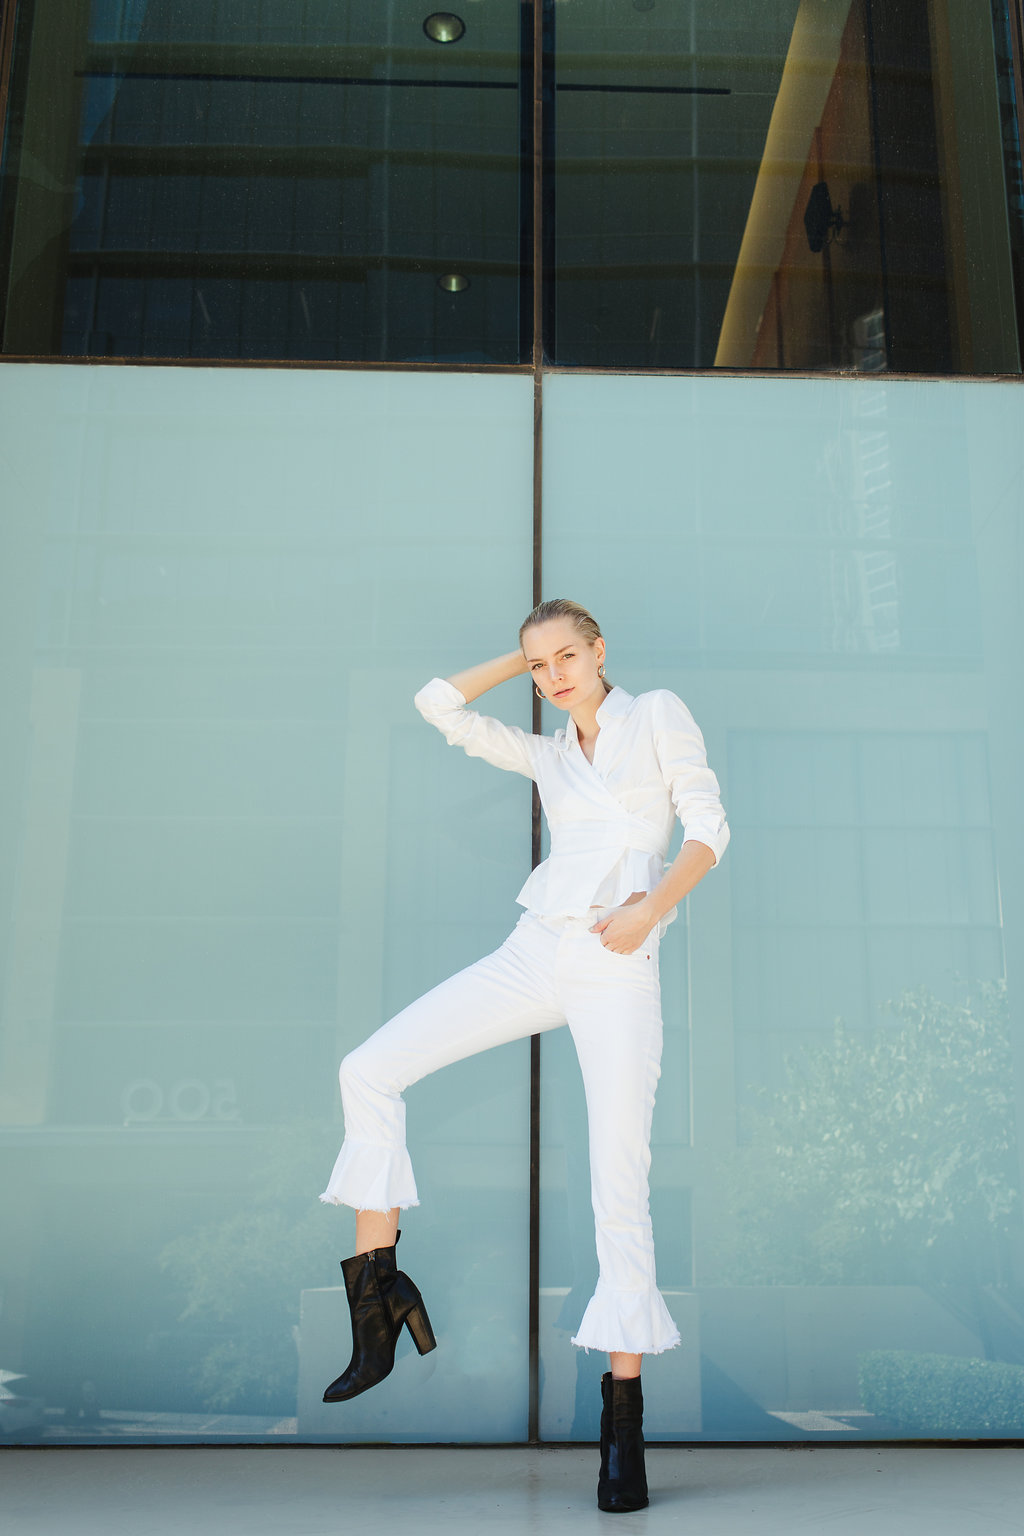 Paige-Newton-Austin-Model-Fashion-Photography0011.jpg